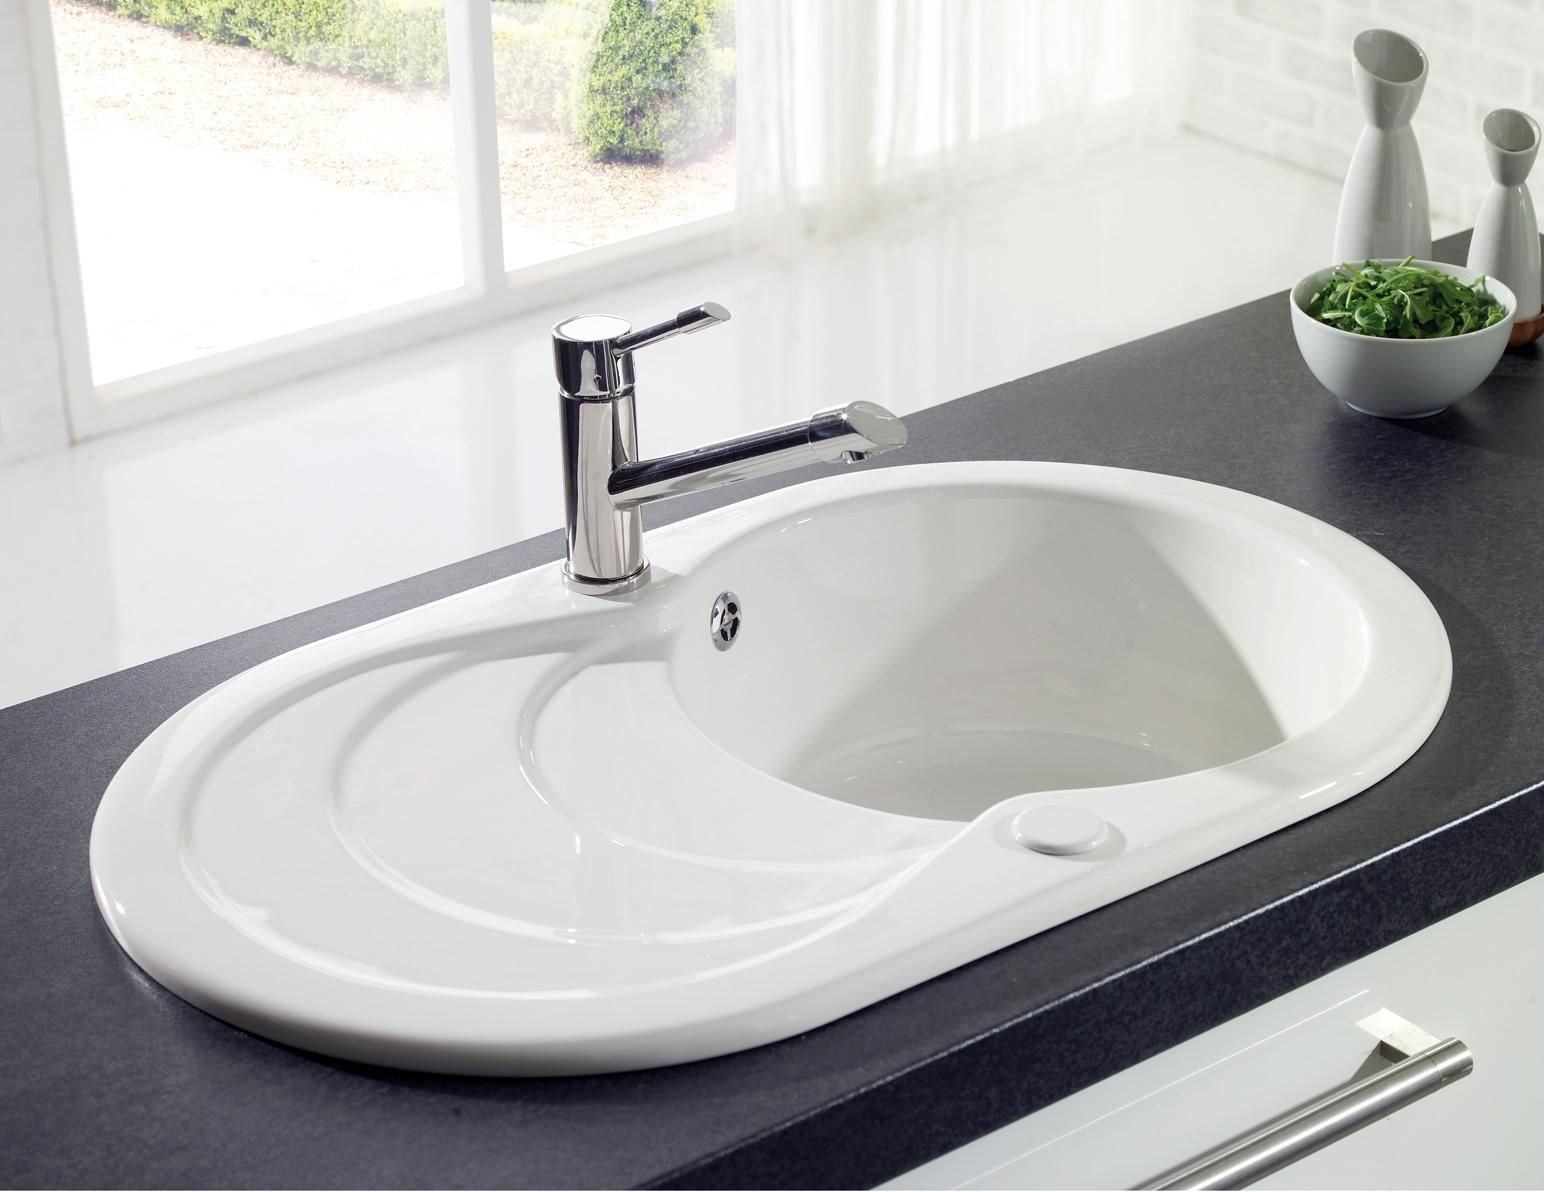 astracast cascade white or black ceramic inset sink 1 0 bowl. Black Bedroom Furniture Sets. Home Design Ideas